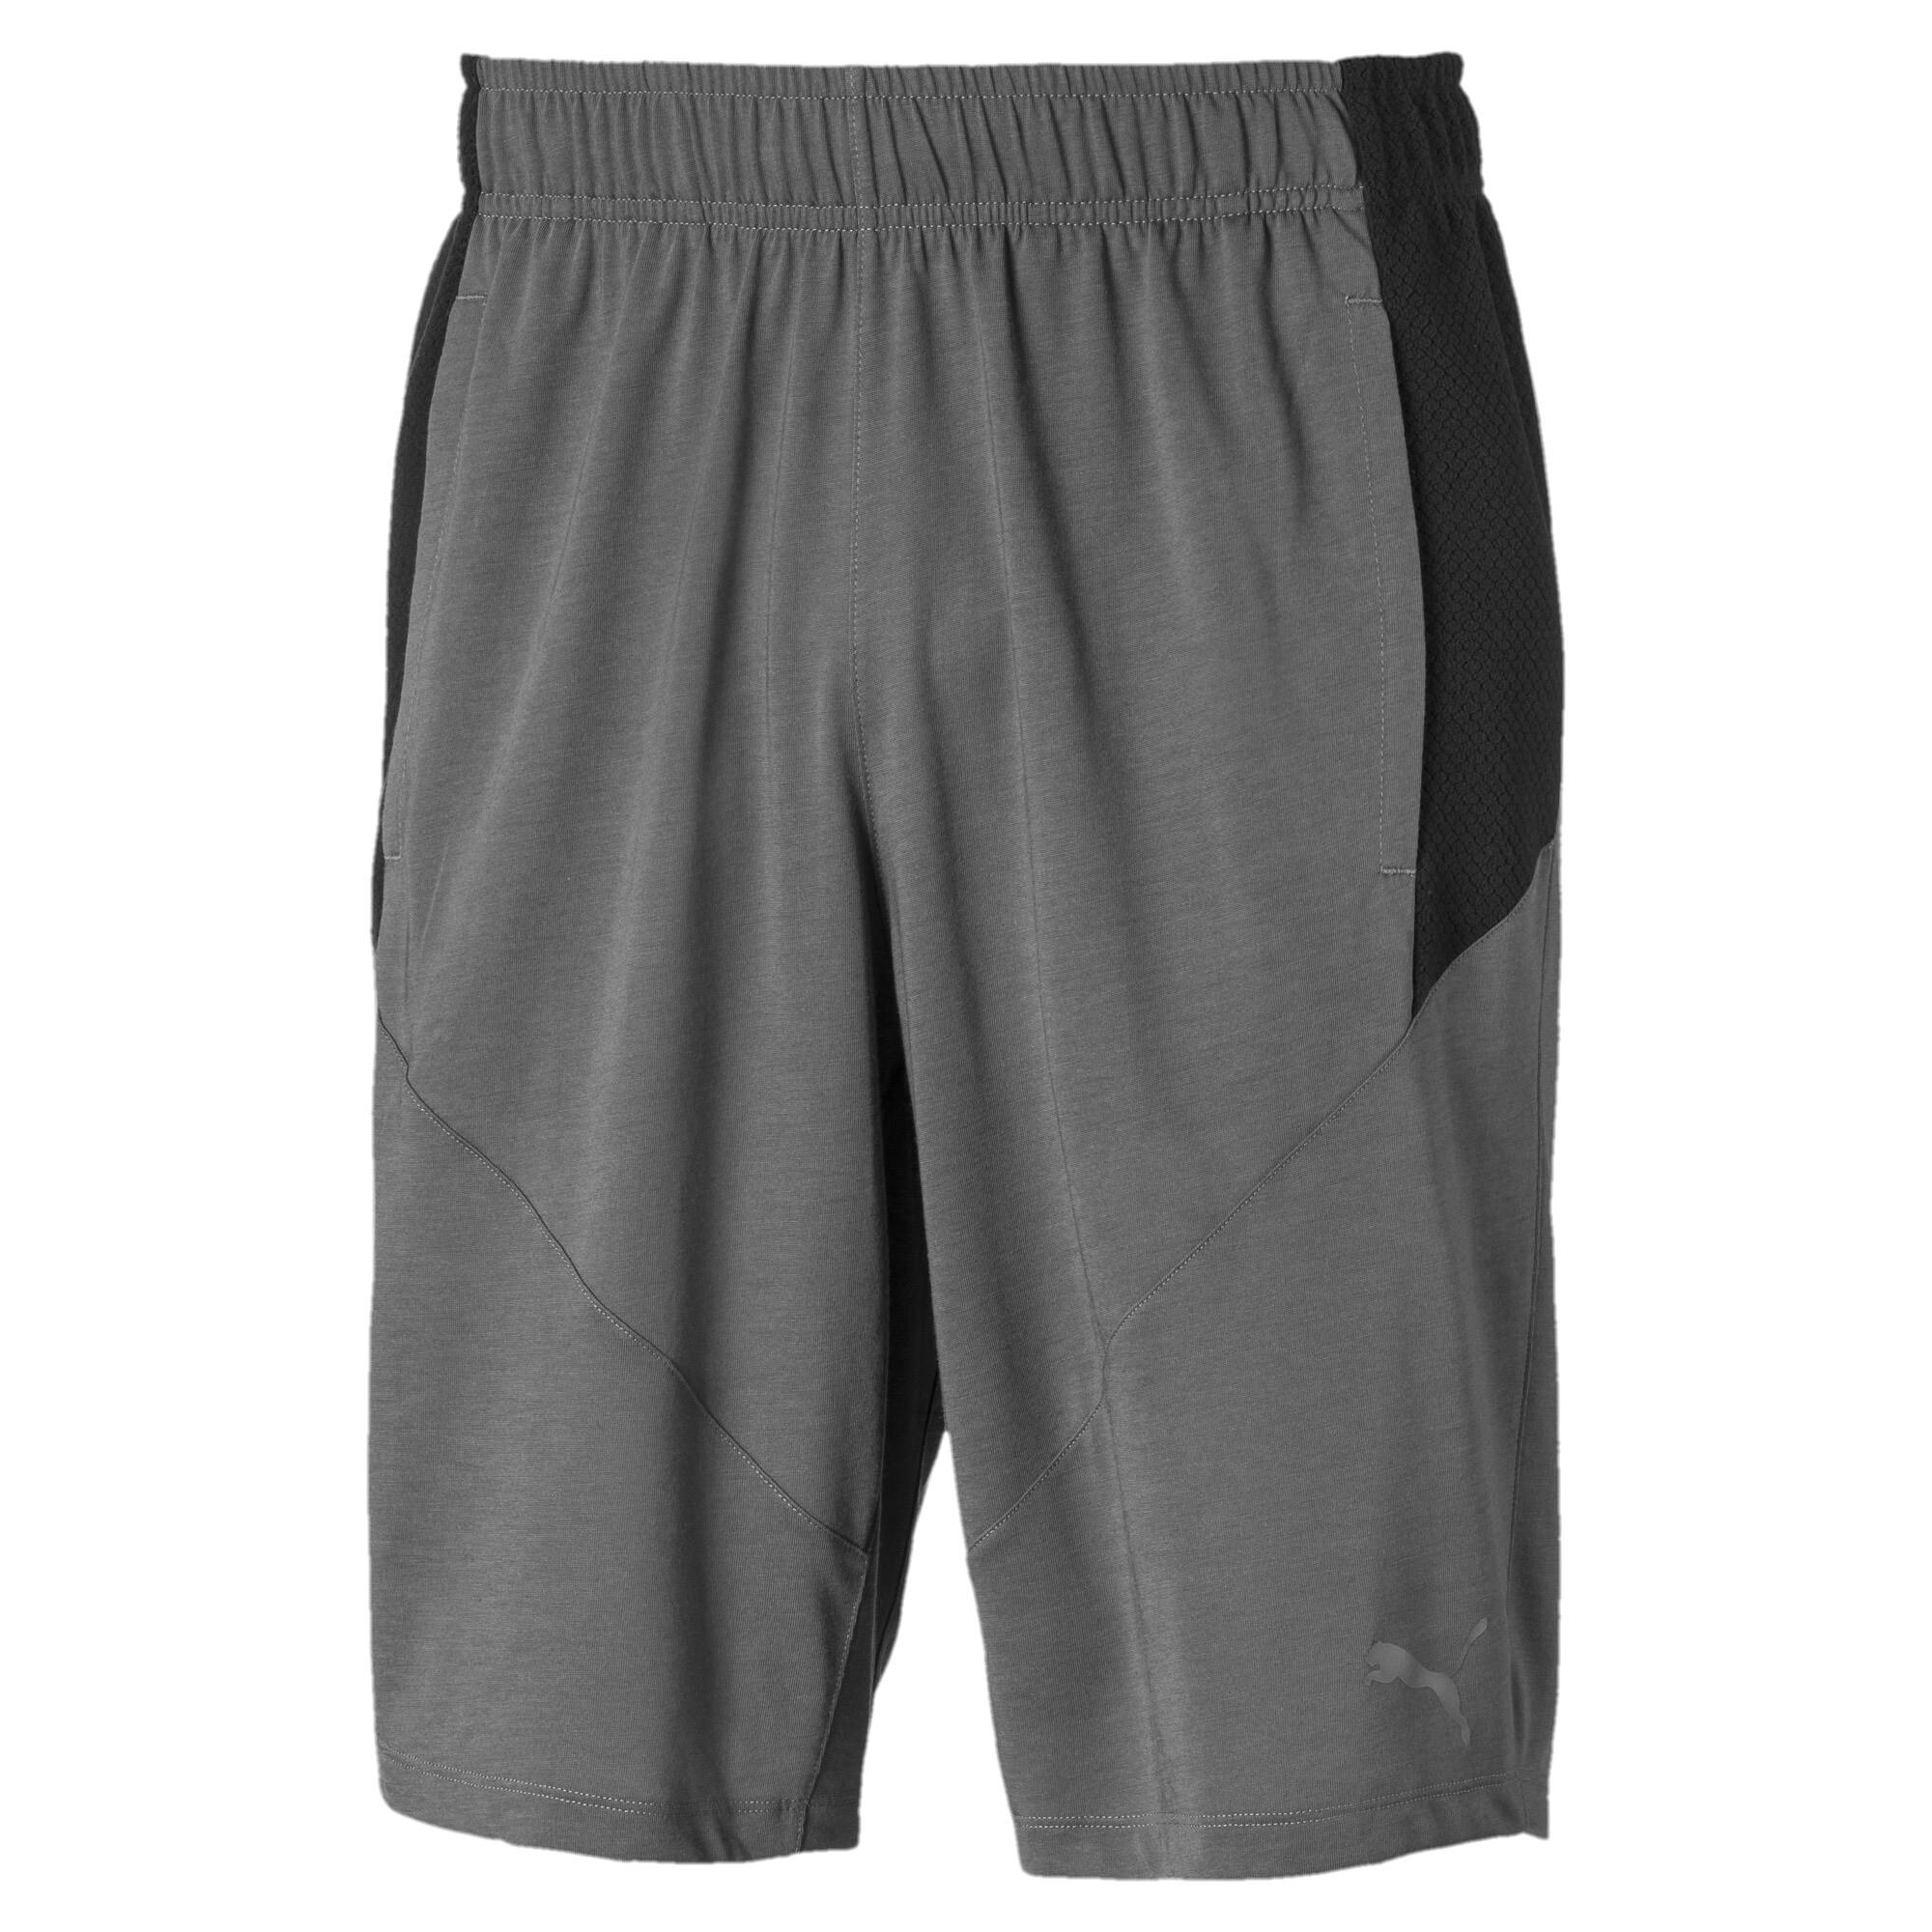 PUMA-Reactive-Drirelease-Men-039-s-Shorts-Men-Knitted-Shorts-Training thumbnail 2